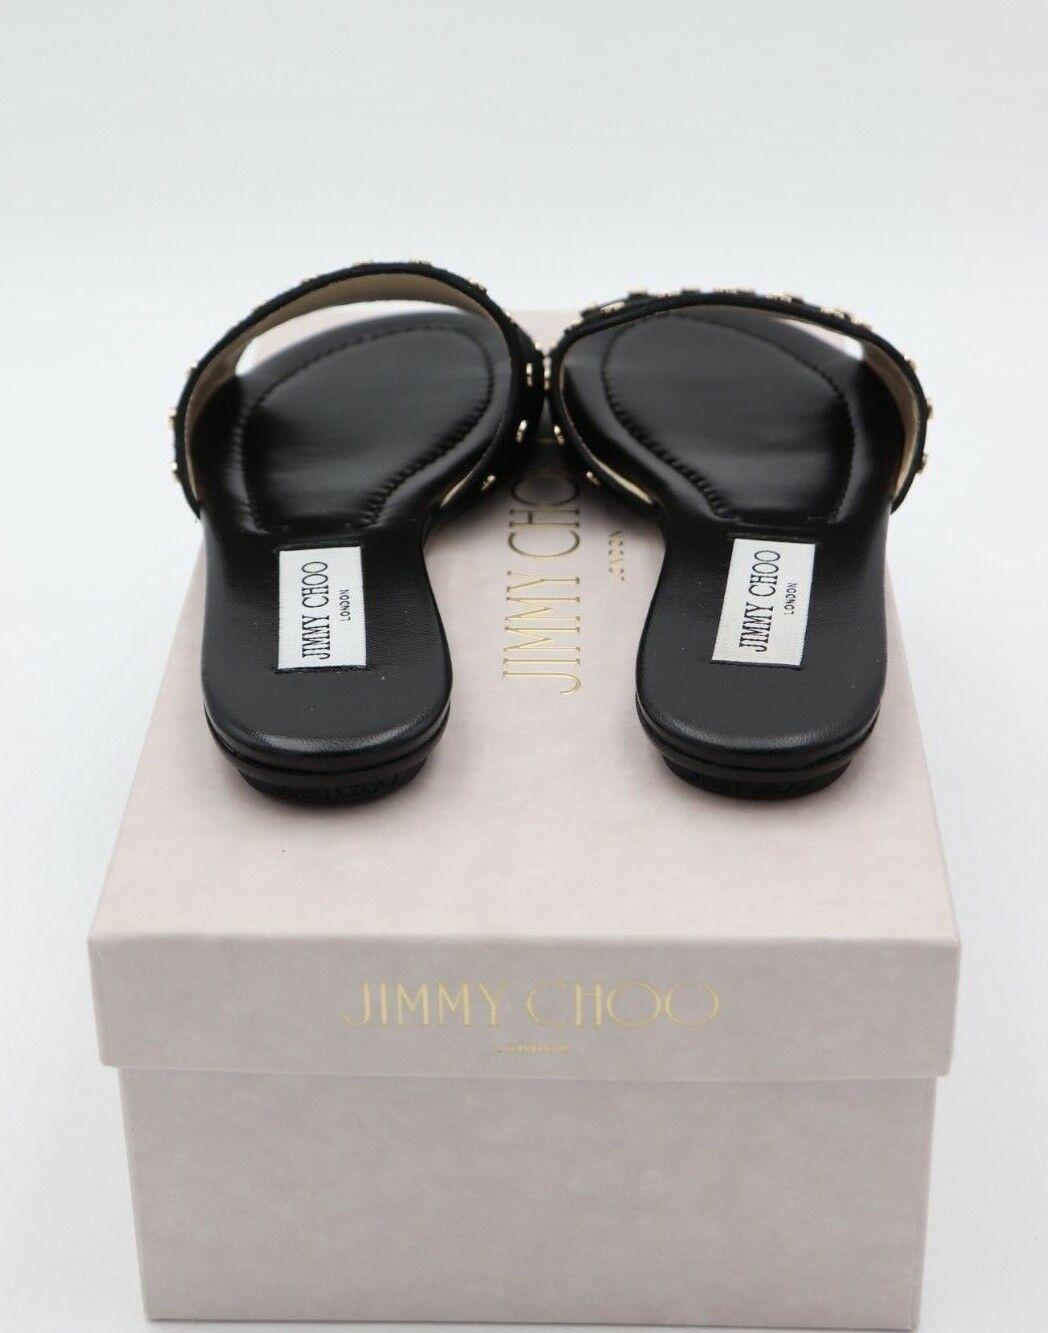 NIB Jimmy Choo Nanda Studded Black Suede Slides Sandals 6 36  $495